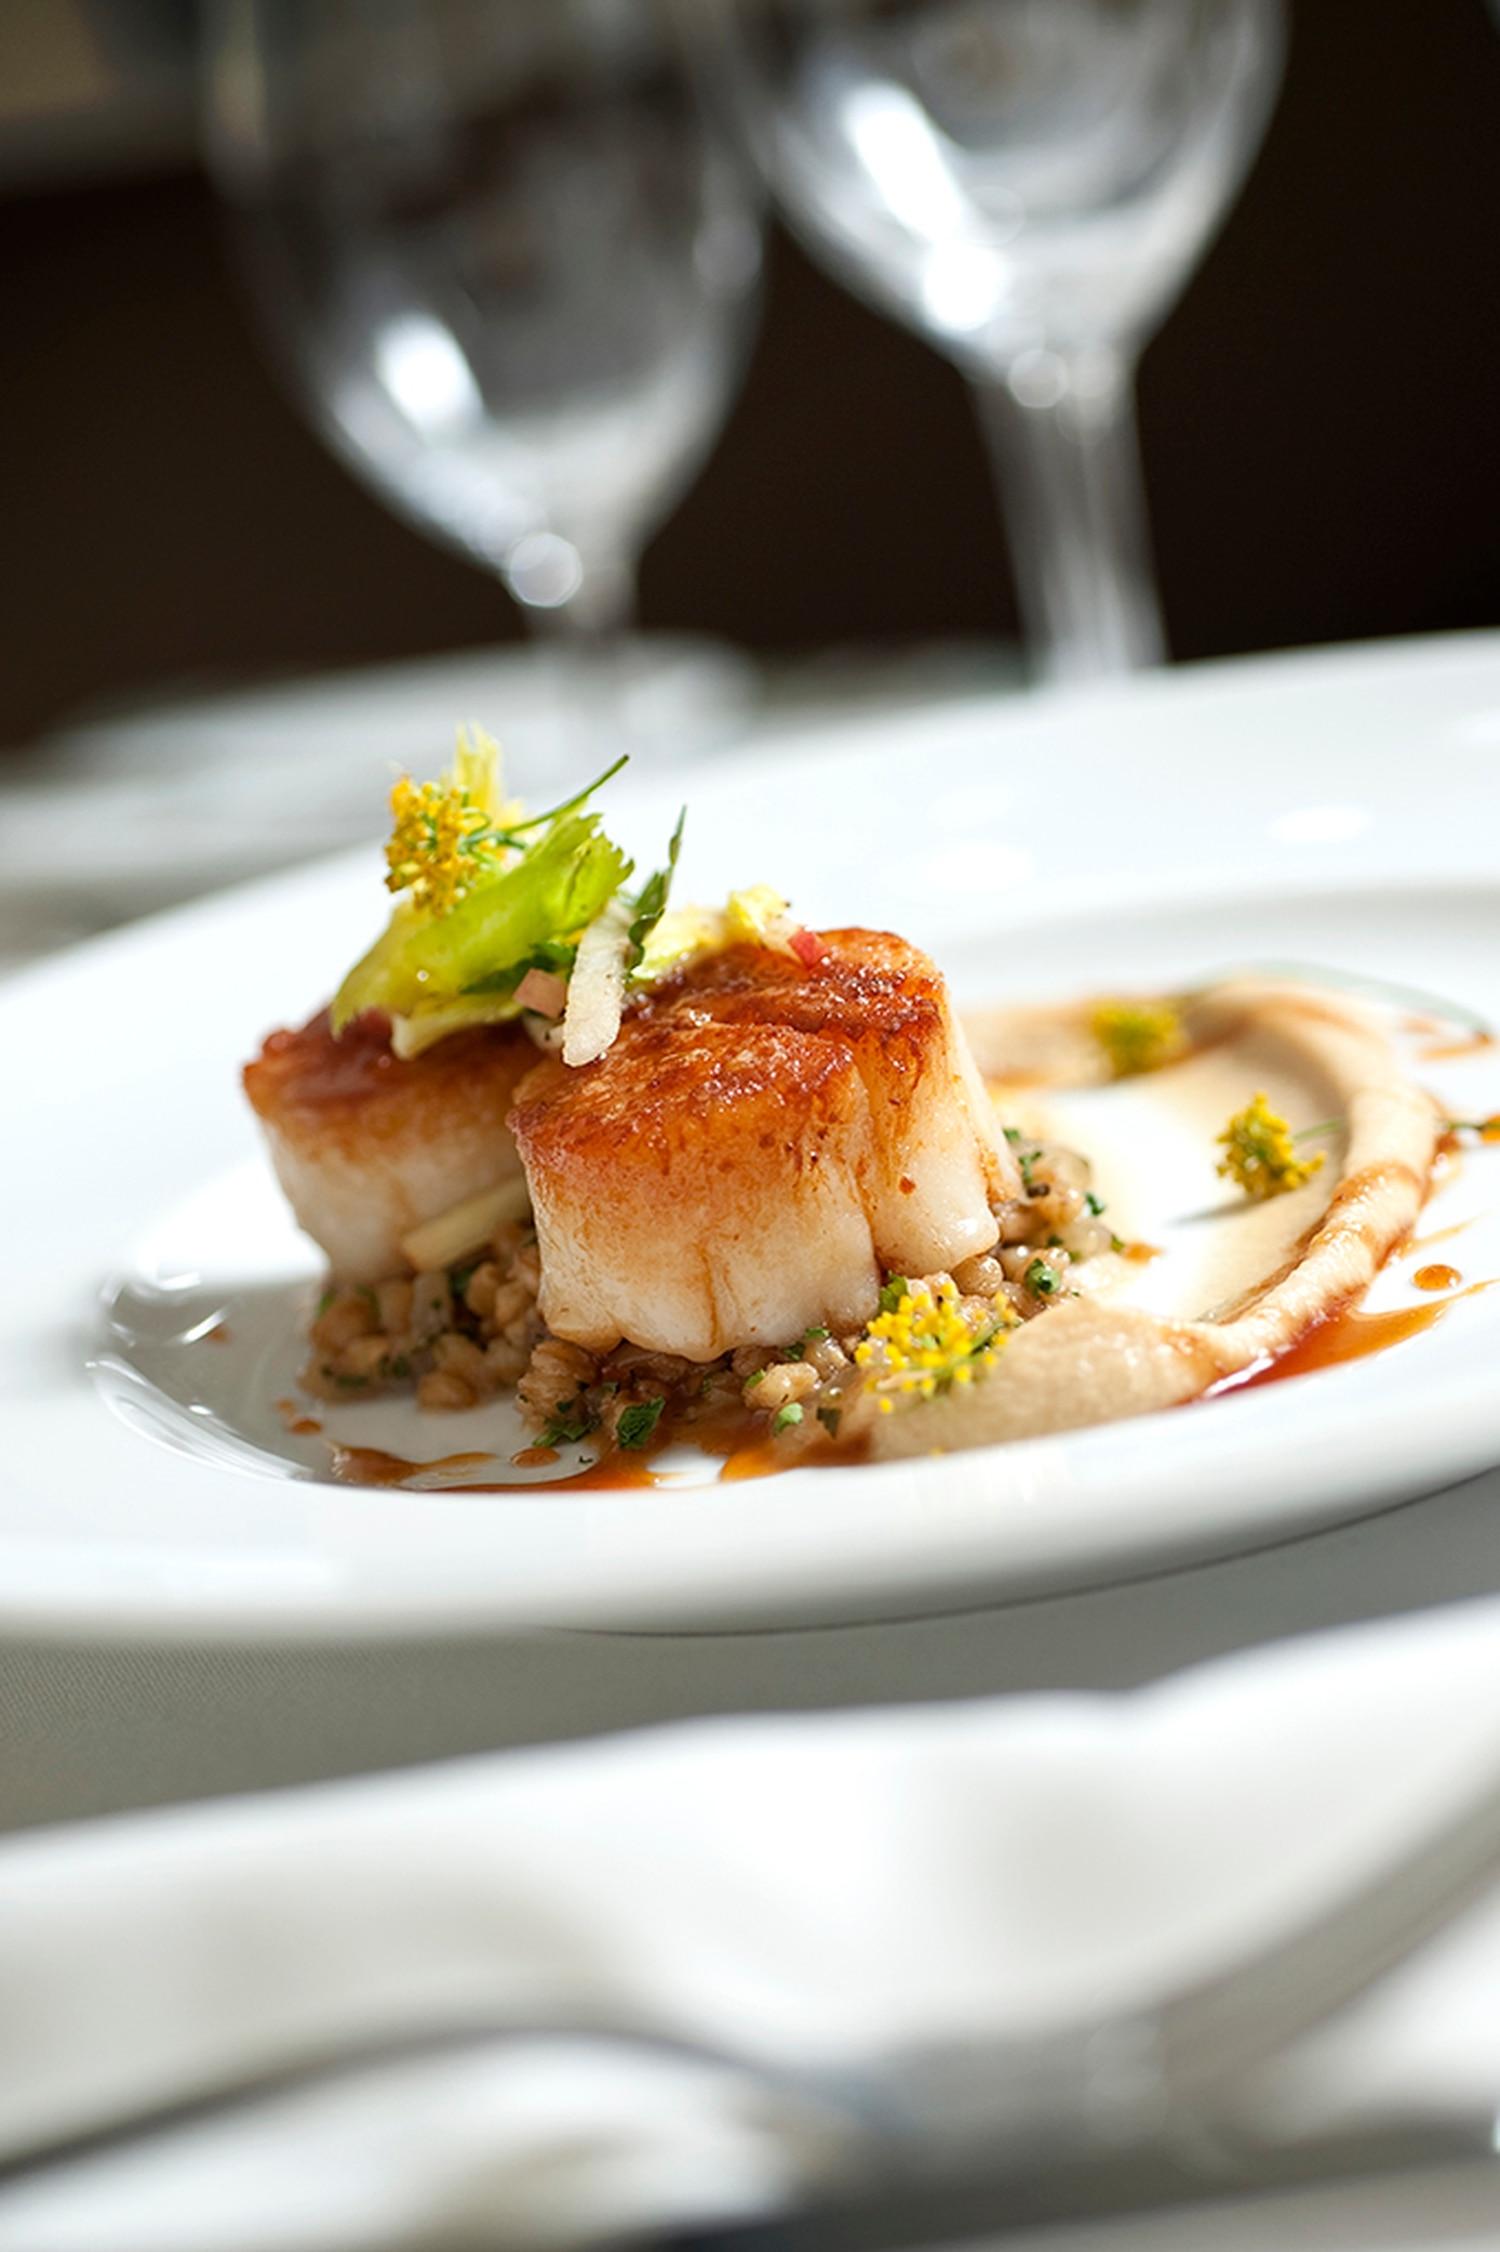 Seared diver scallops; caramelized onion and foie gras farotto; cider reduction